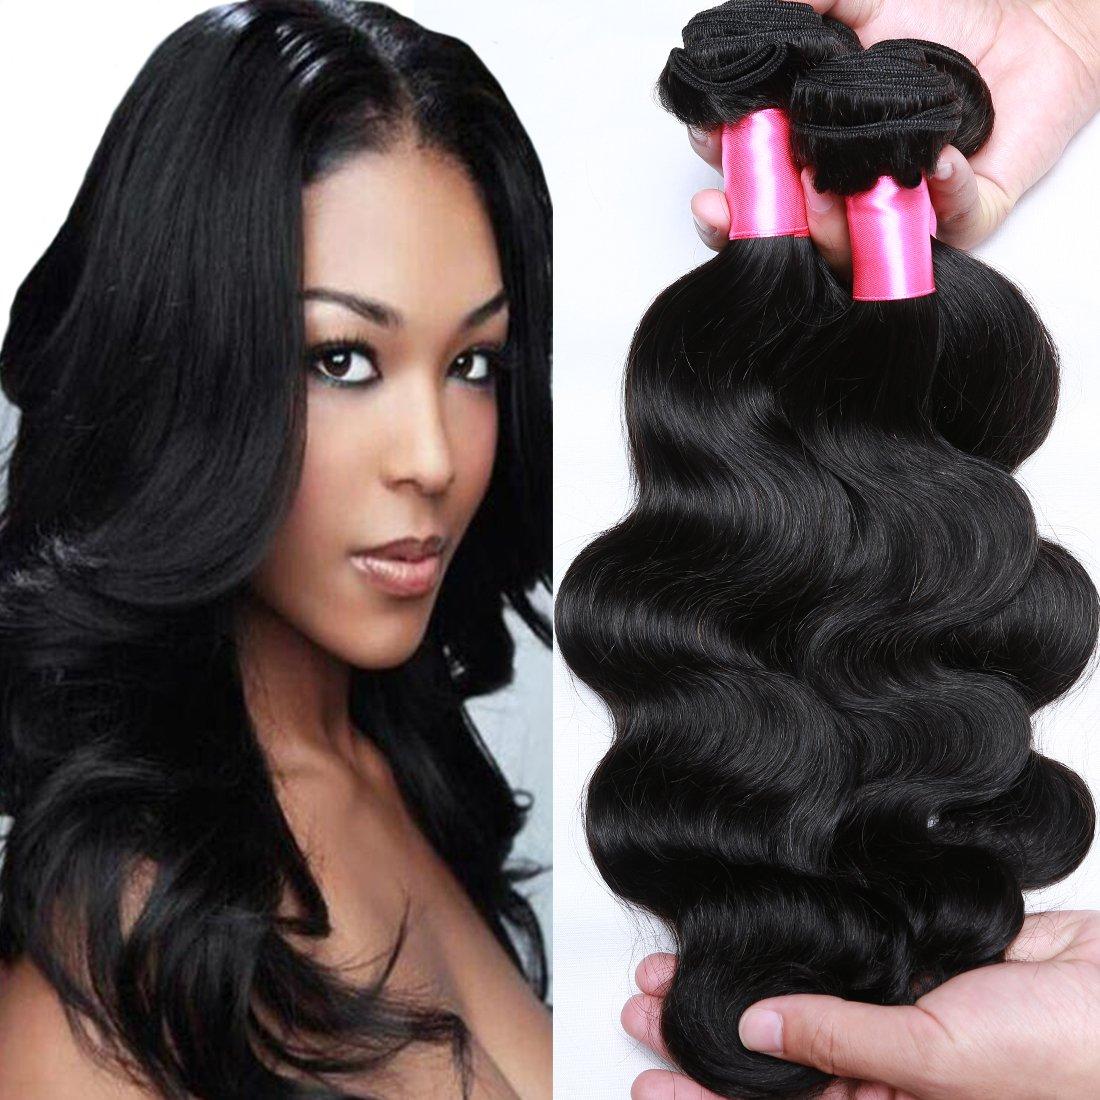 Cranberry Hair Brazilian Virgin Hair Body Wave Cheap Remy Human Hair 4 Bundles Weaves 100% Unprocessed Virgin Hair Bundles Extensions Natural Black Color(18'' 20'' 22'' 24'') by Cranberry Hair (Image #1)